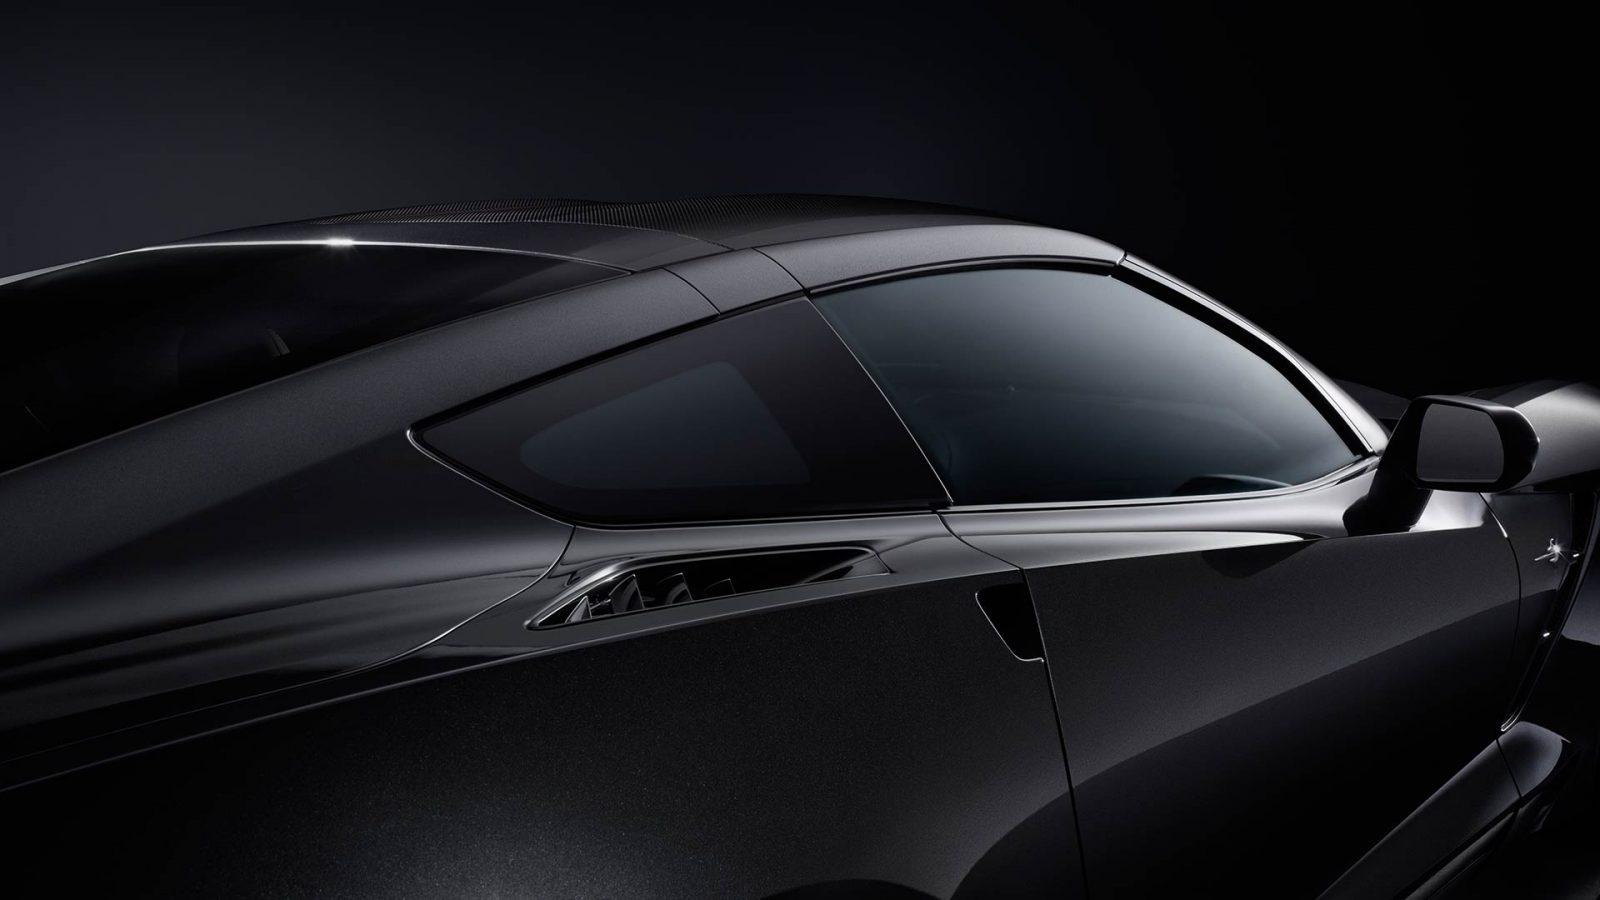 2014 Corvette Stingray Colors Gallery24